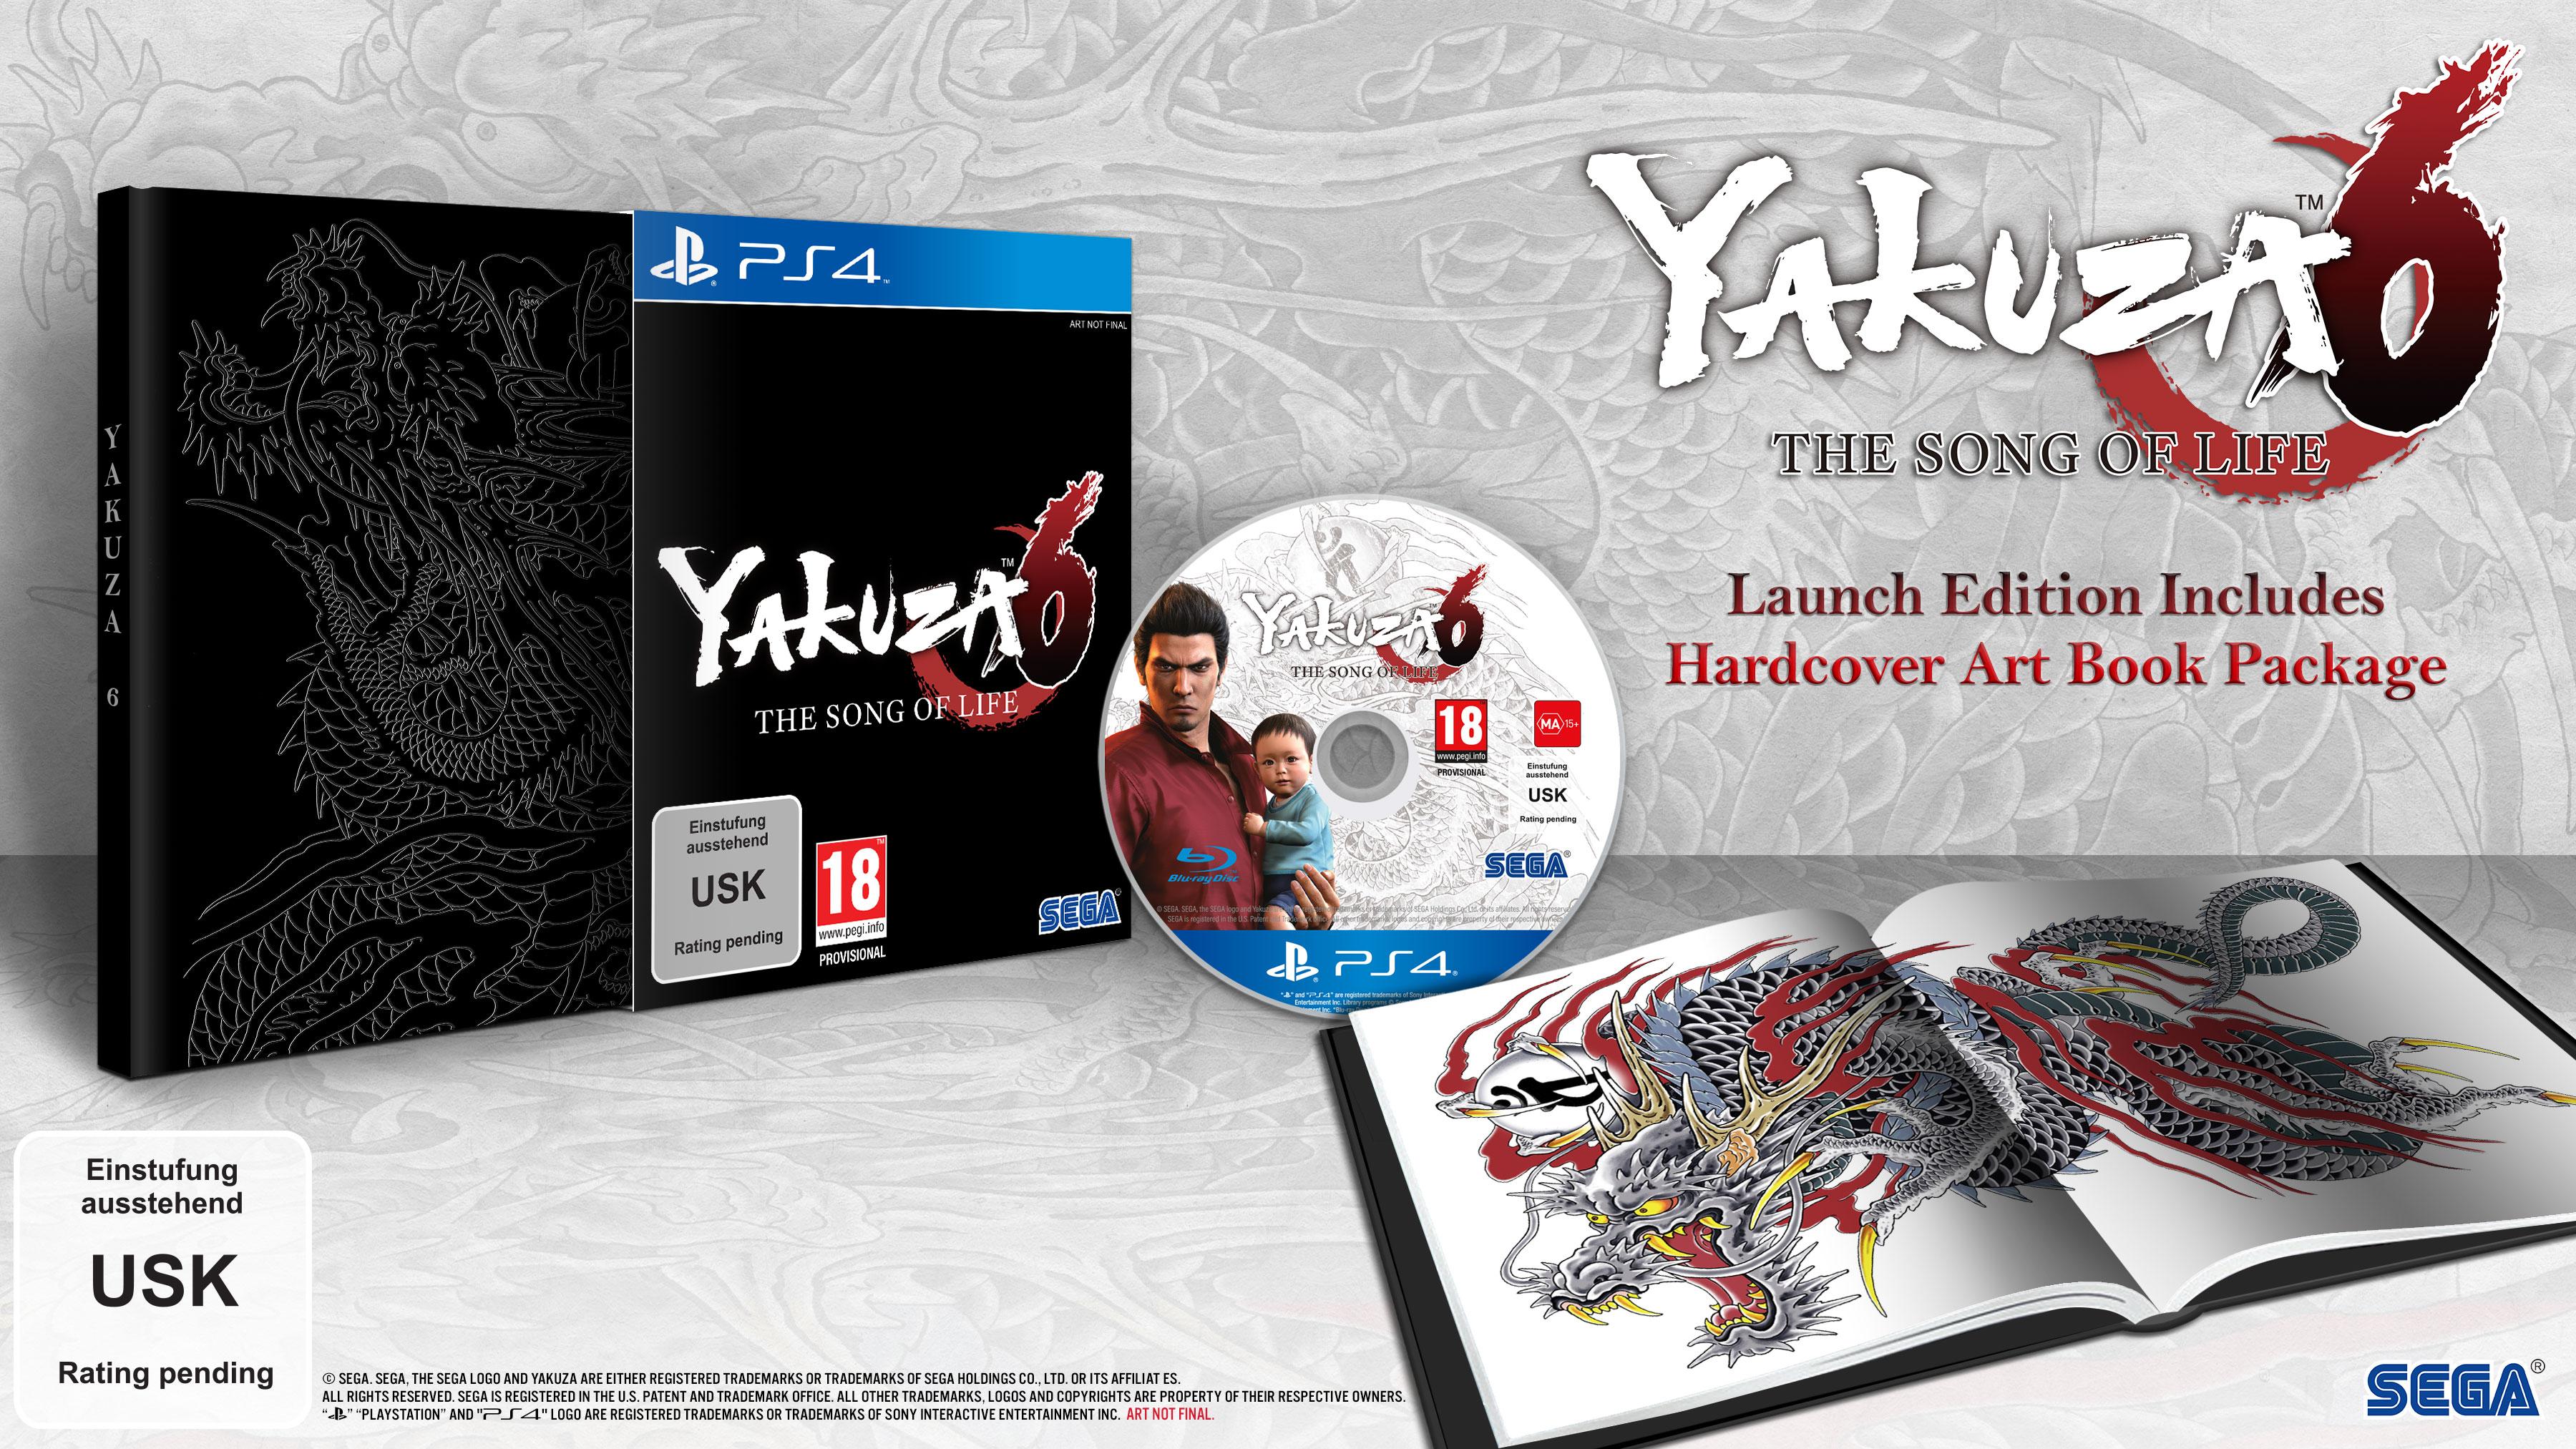 Yakuza 6 Das Lied des Lebens Launch Edition